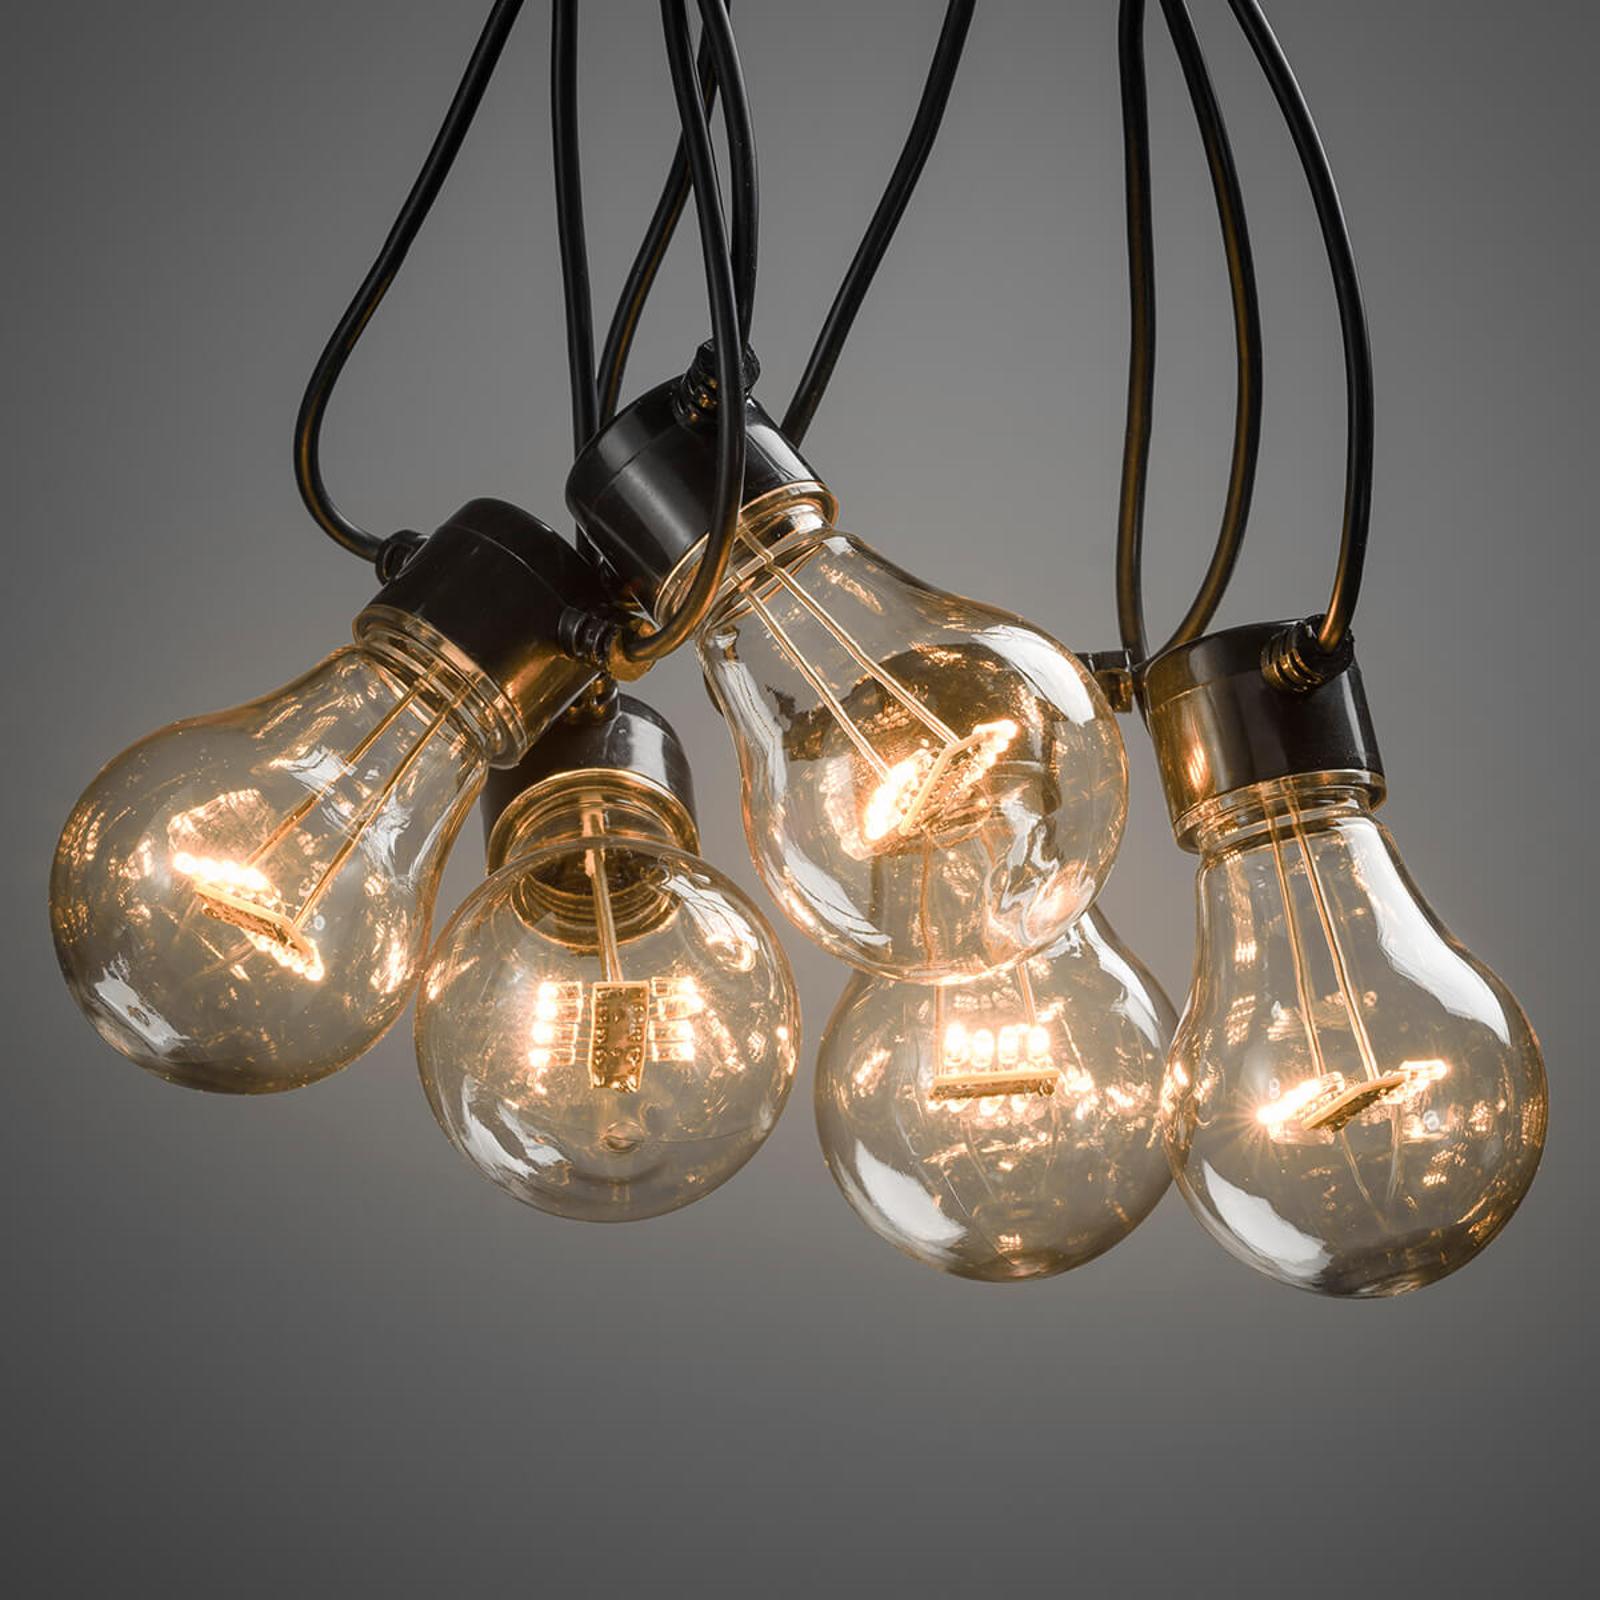 10-lamps LED lichtketting Biergarten